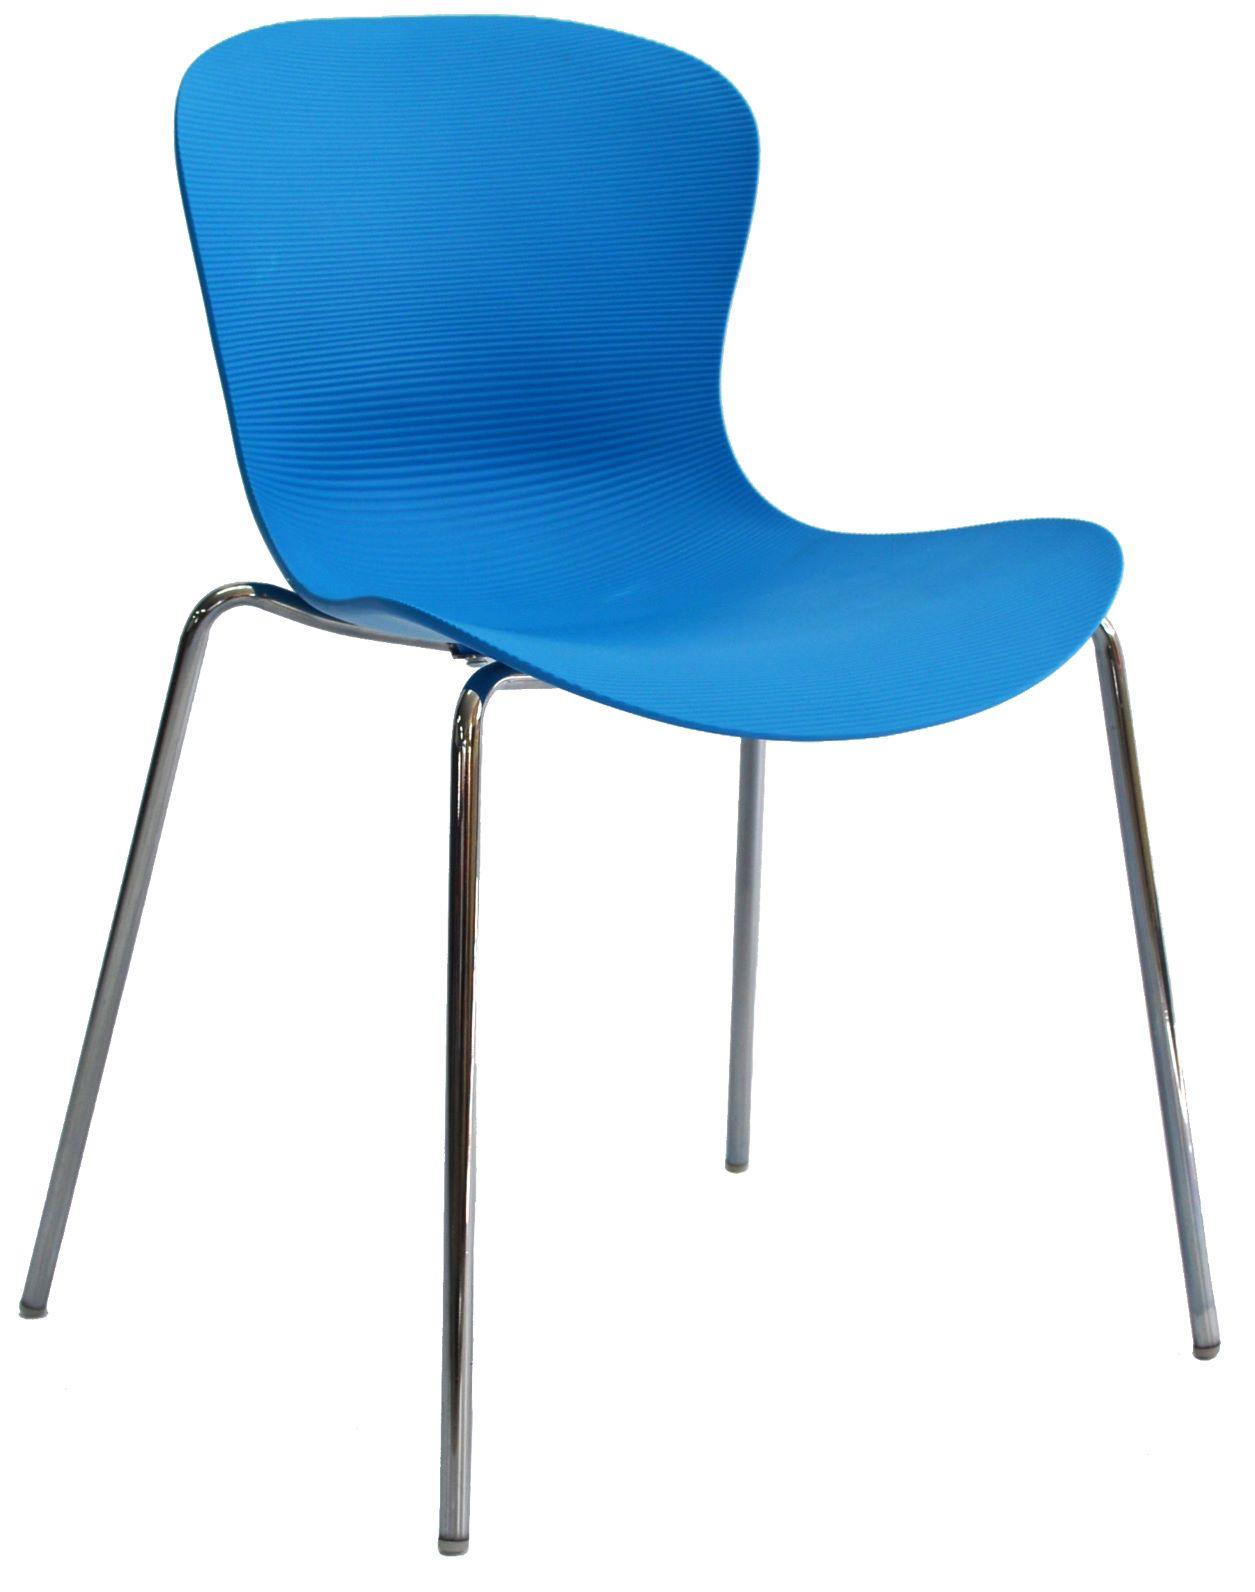 GS1401-藍